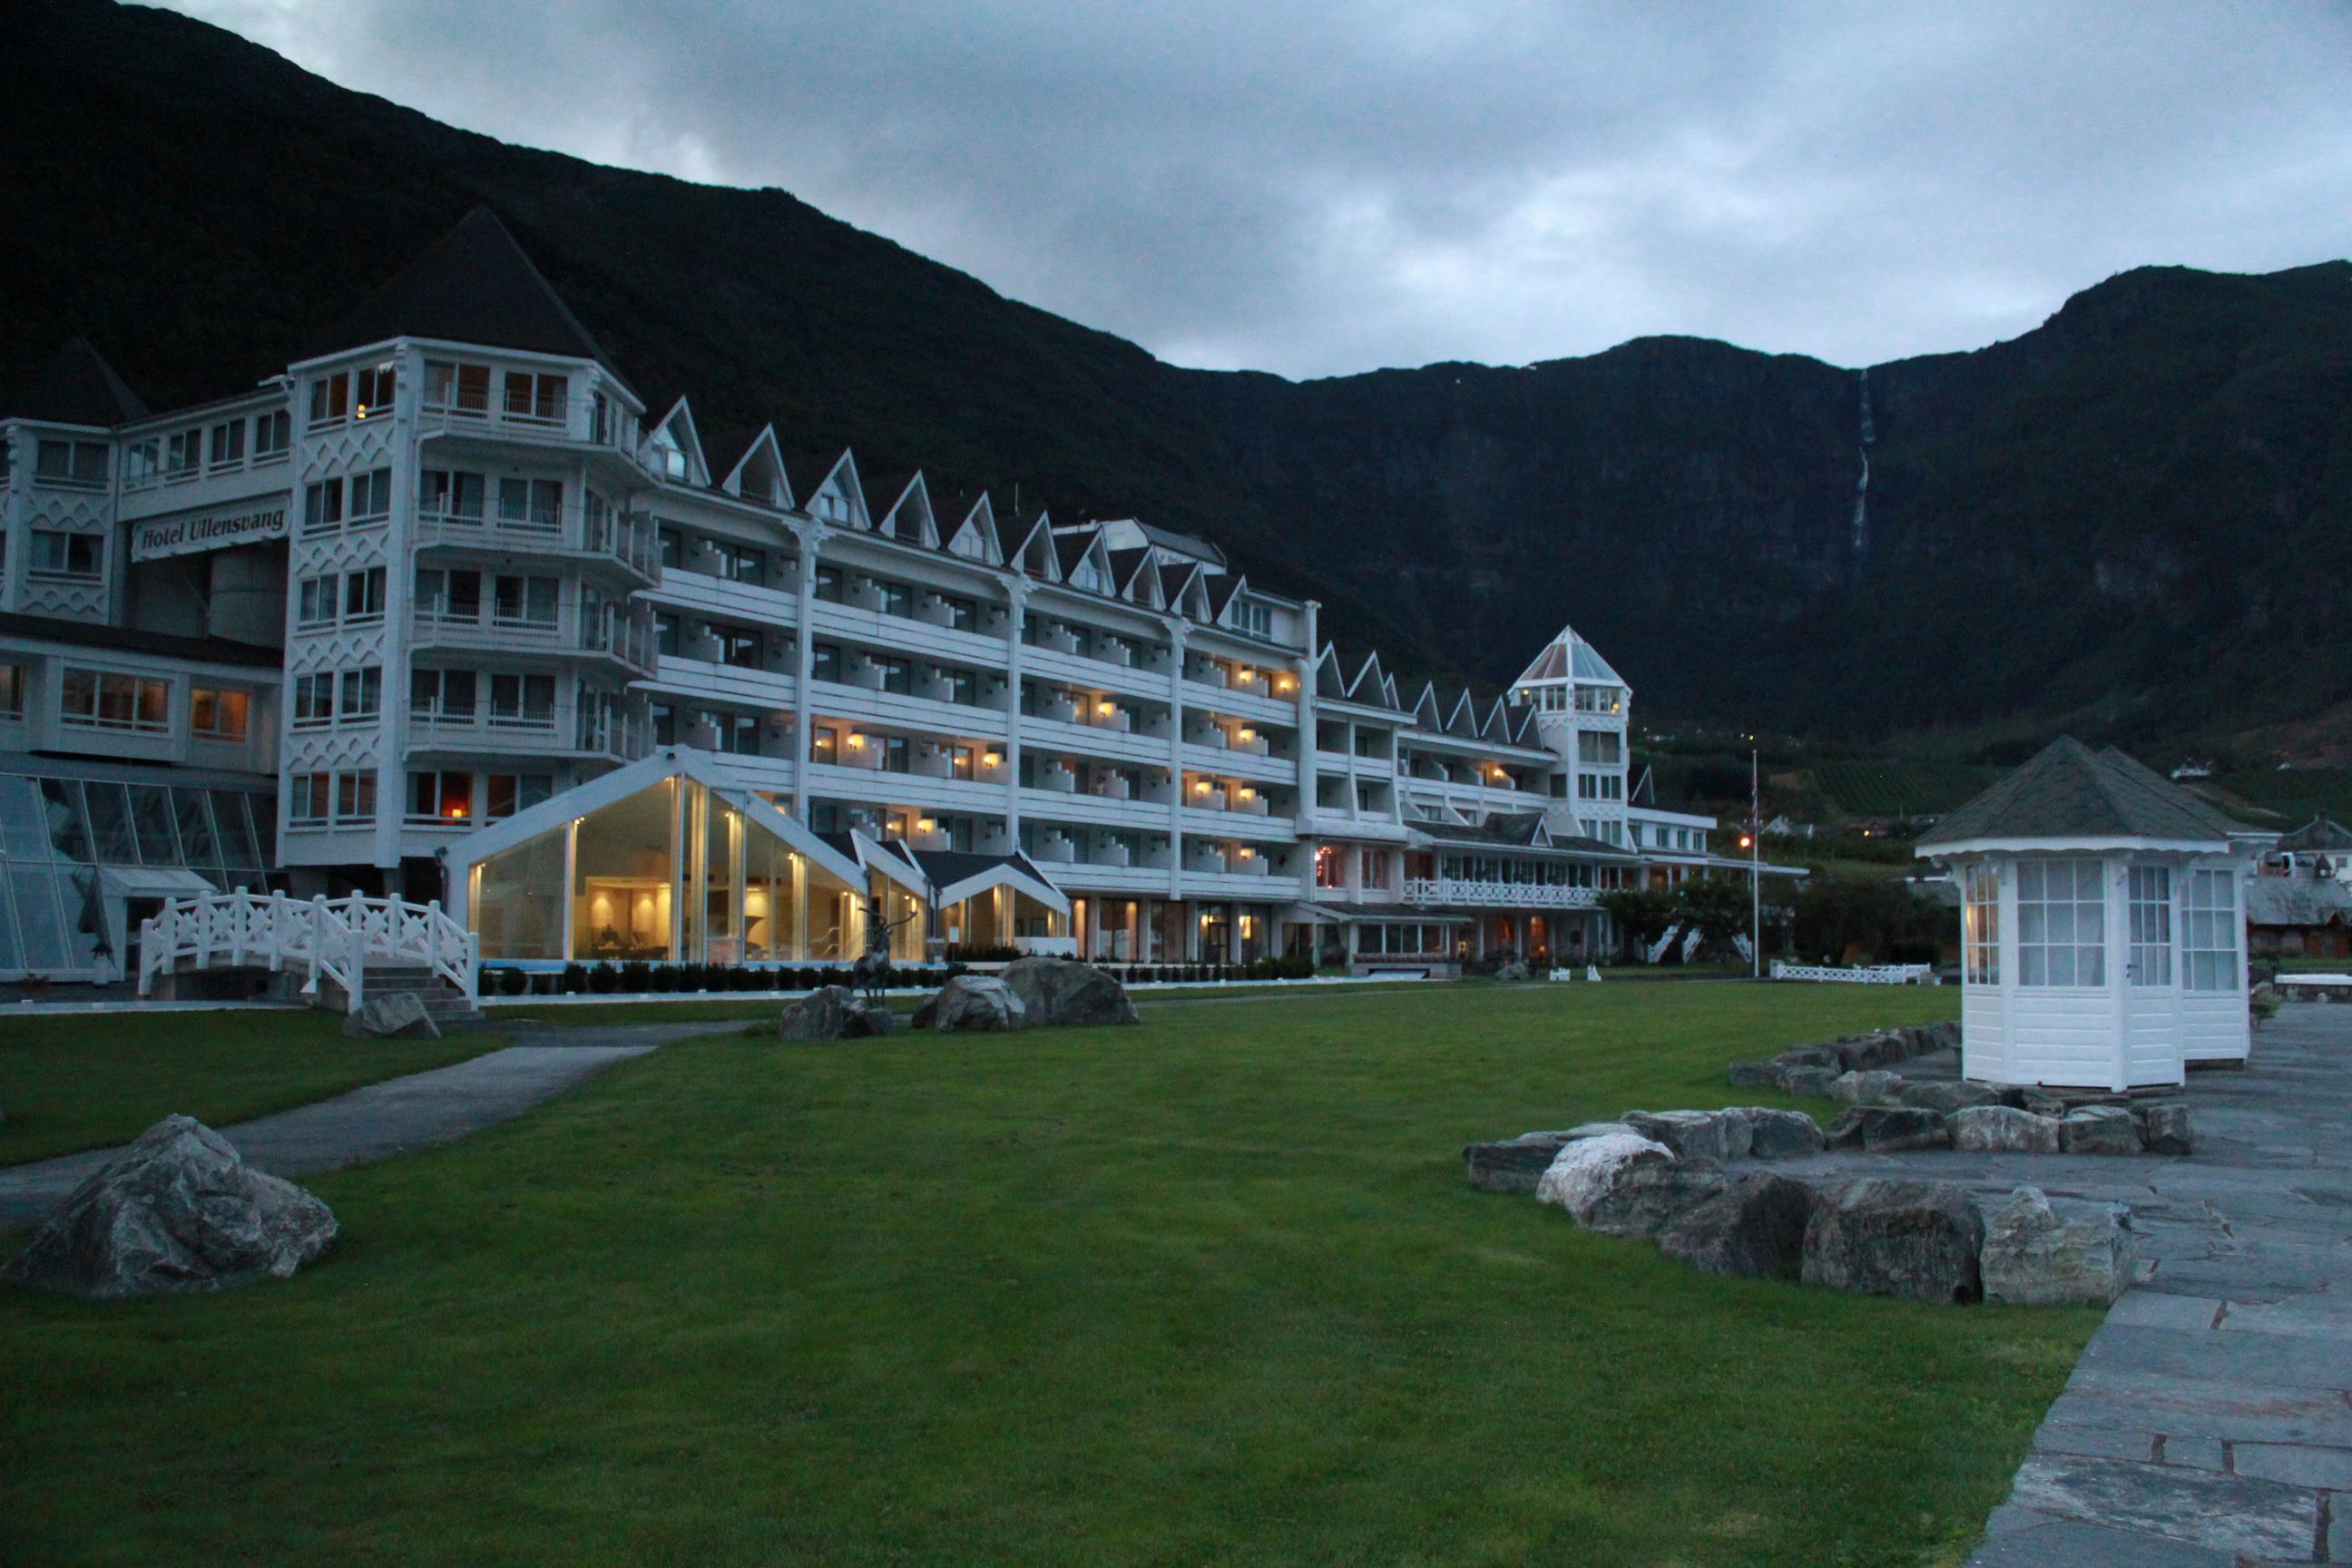 Hotel Ullensvang